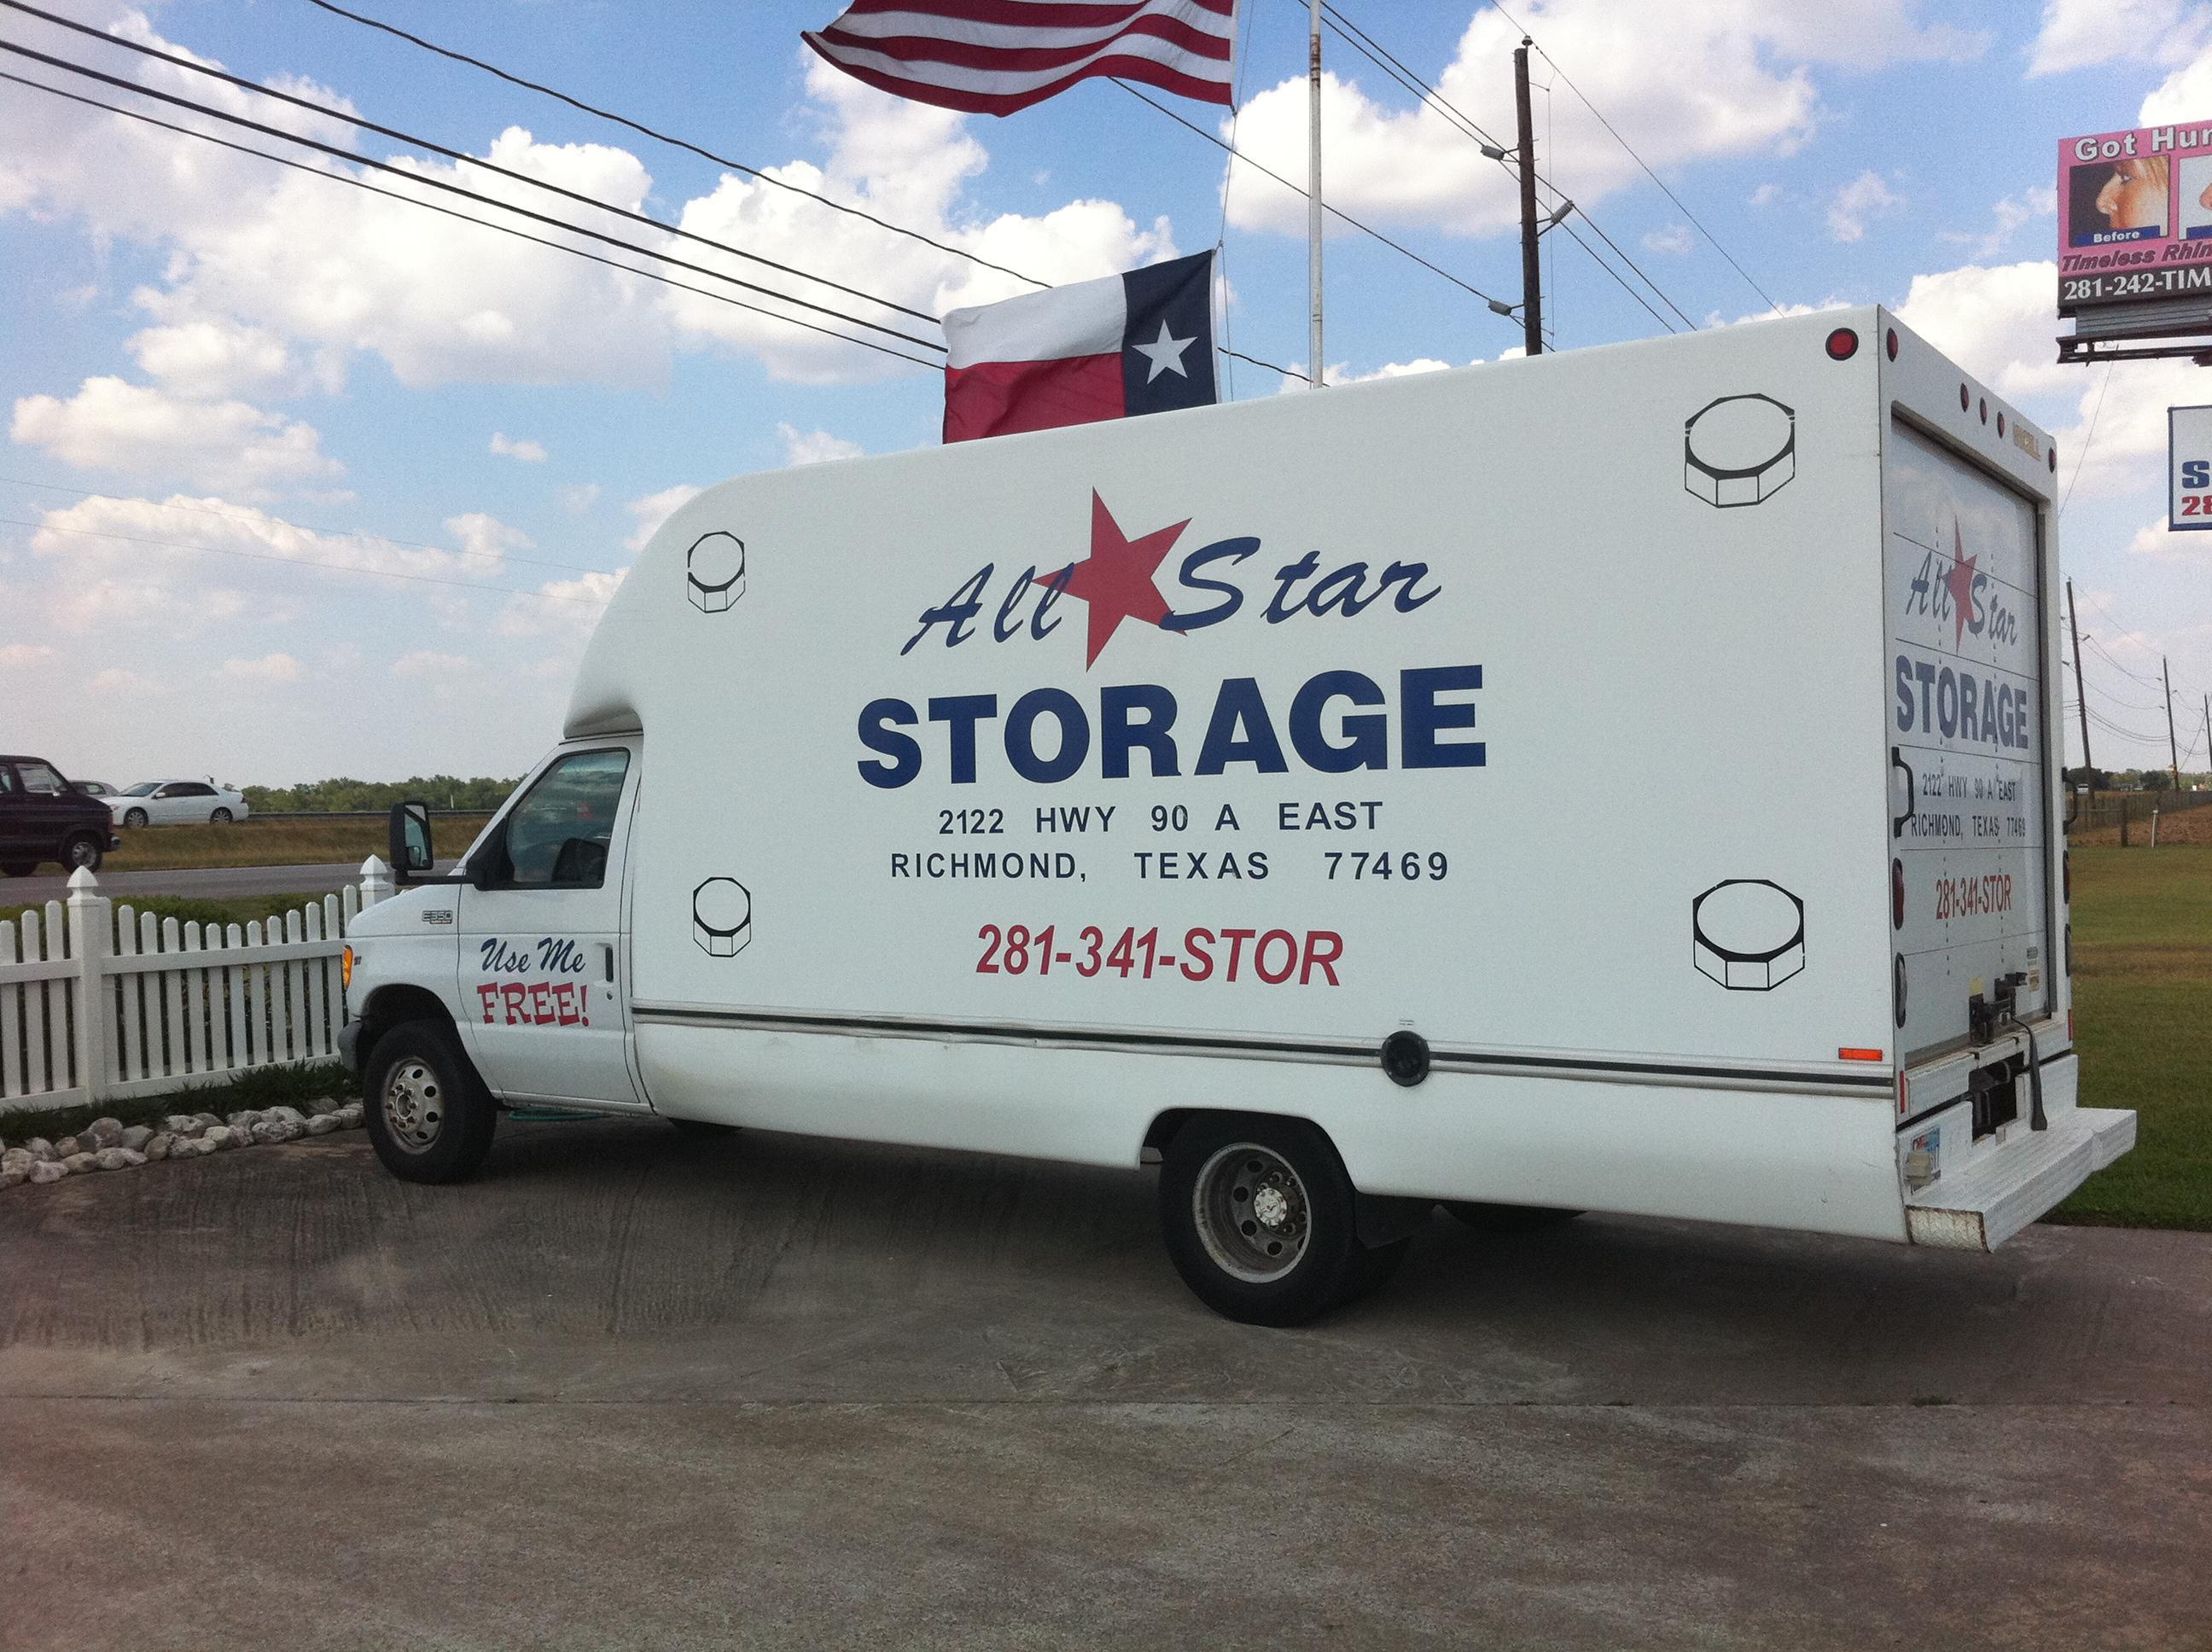 All Star Storage image 1